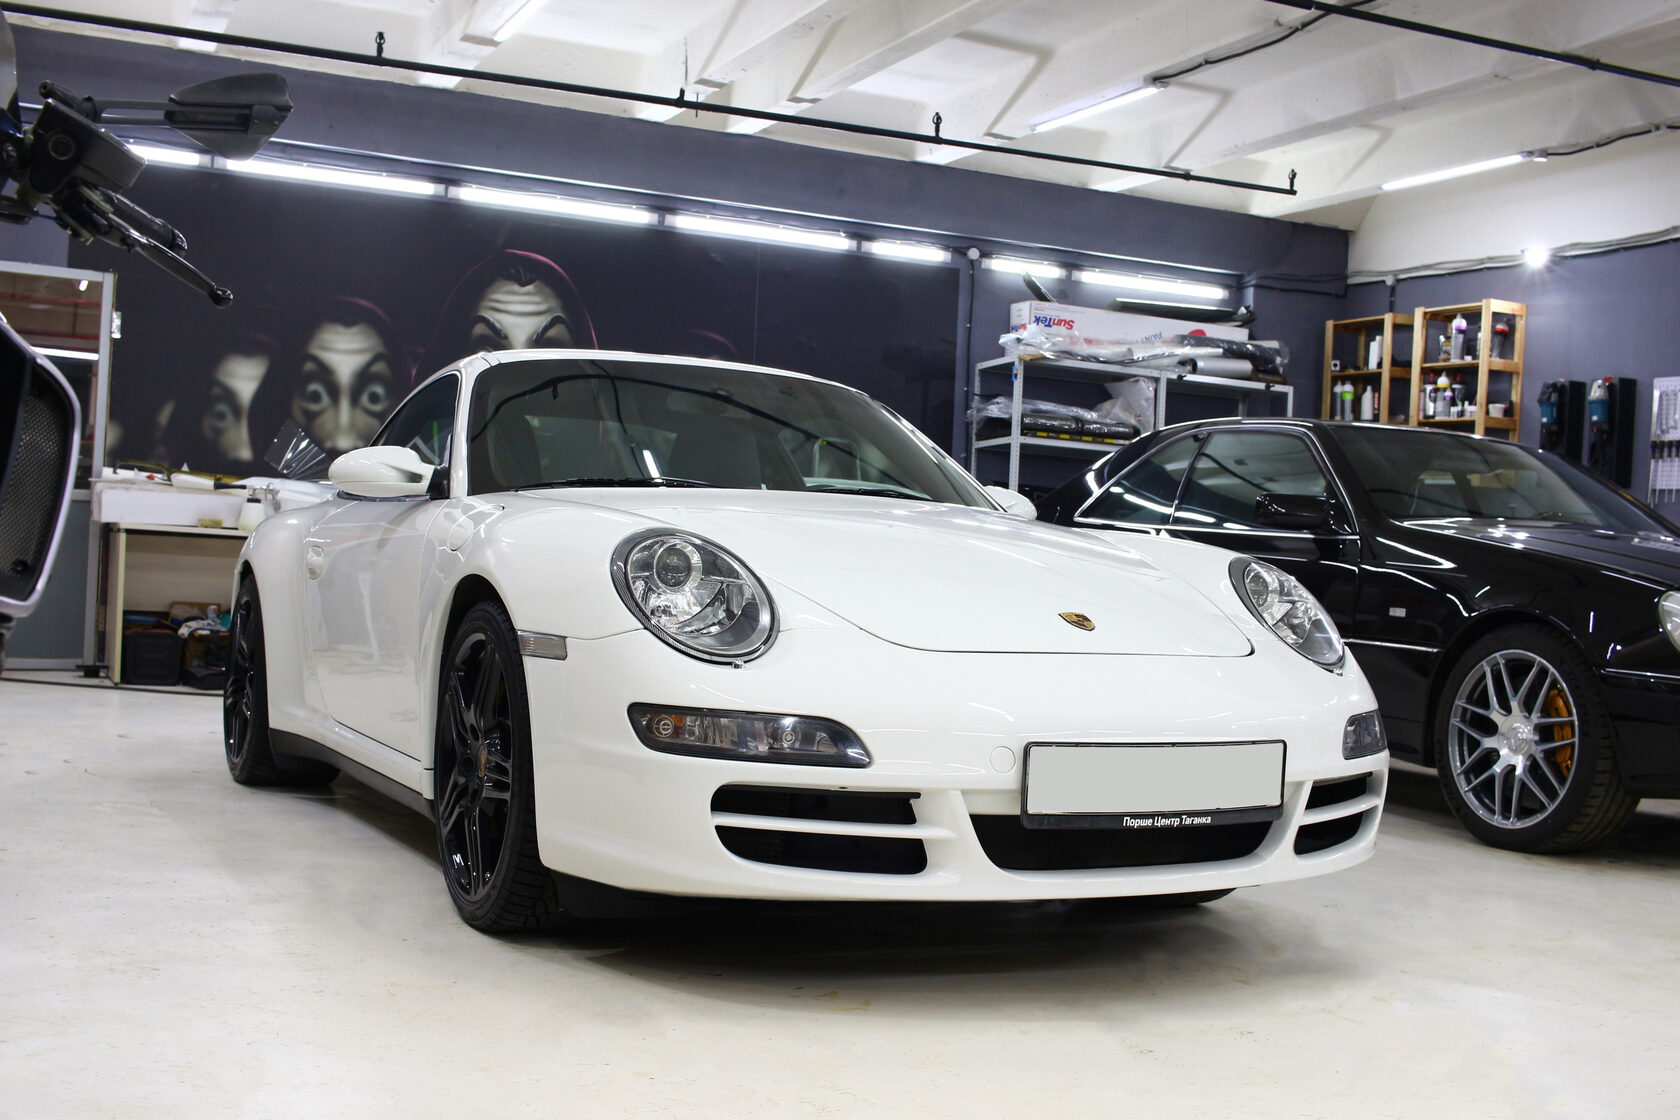 Porsche 911 Carrera 4S, детейлинг, реставрация, покраска кожи, полирвока фар, детейлинг центр москва